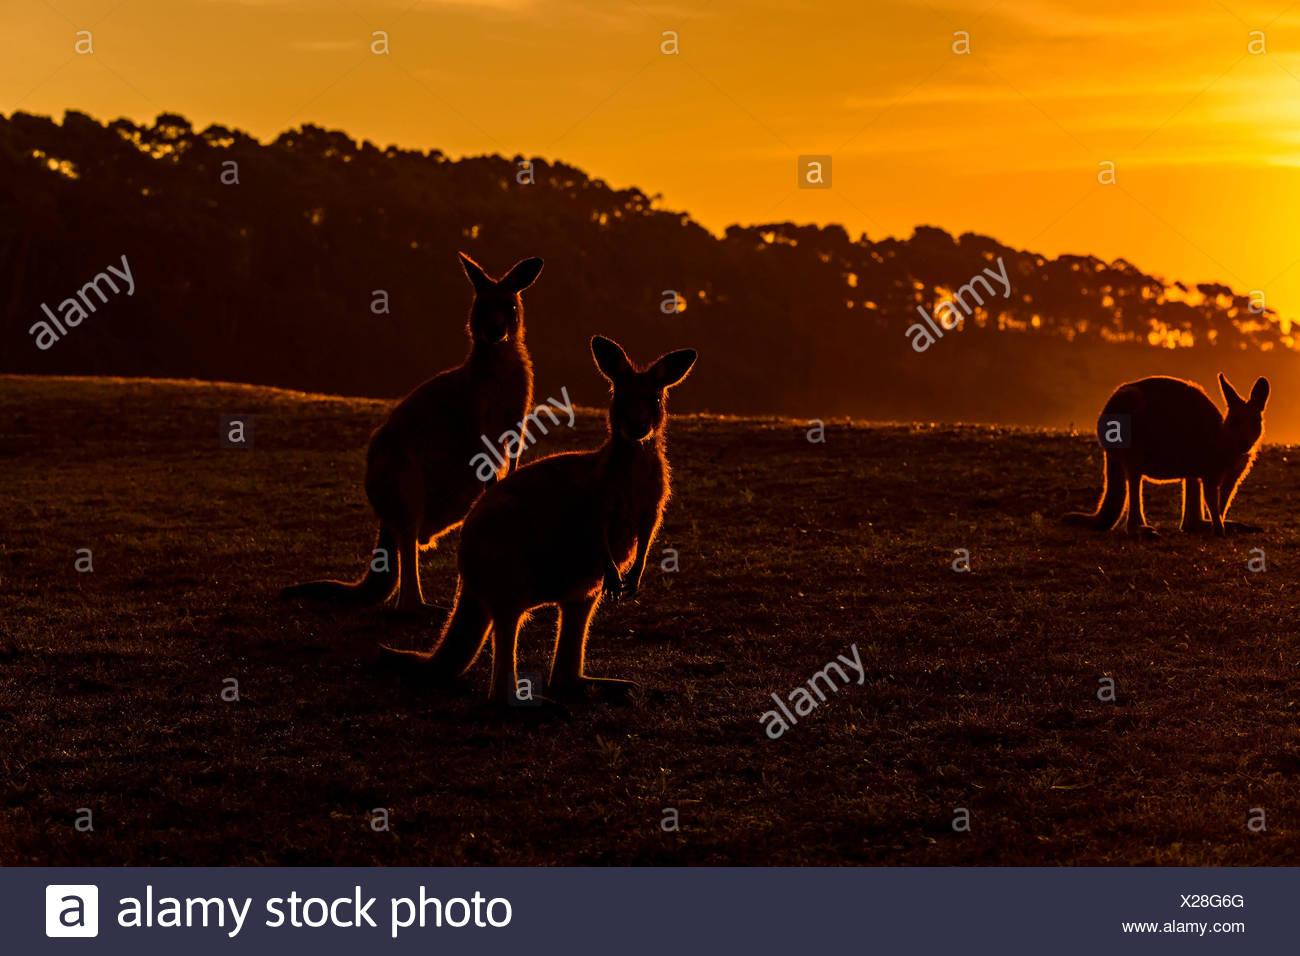 Kangourou gris, Macropus giganteus, Groupe d'animaux au lever du soleil, Murramarang National Park, New South Wales, Australie Photo Stock